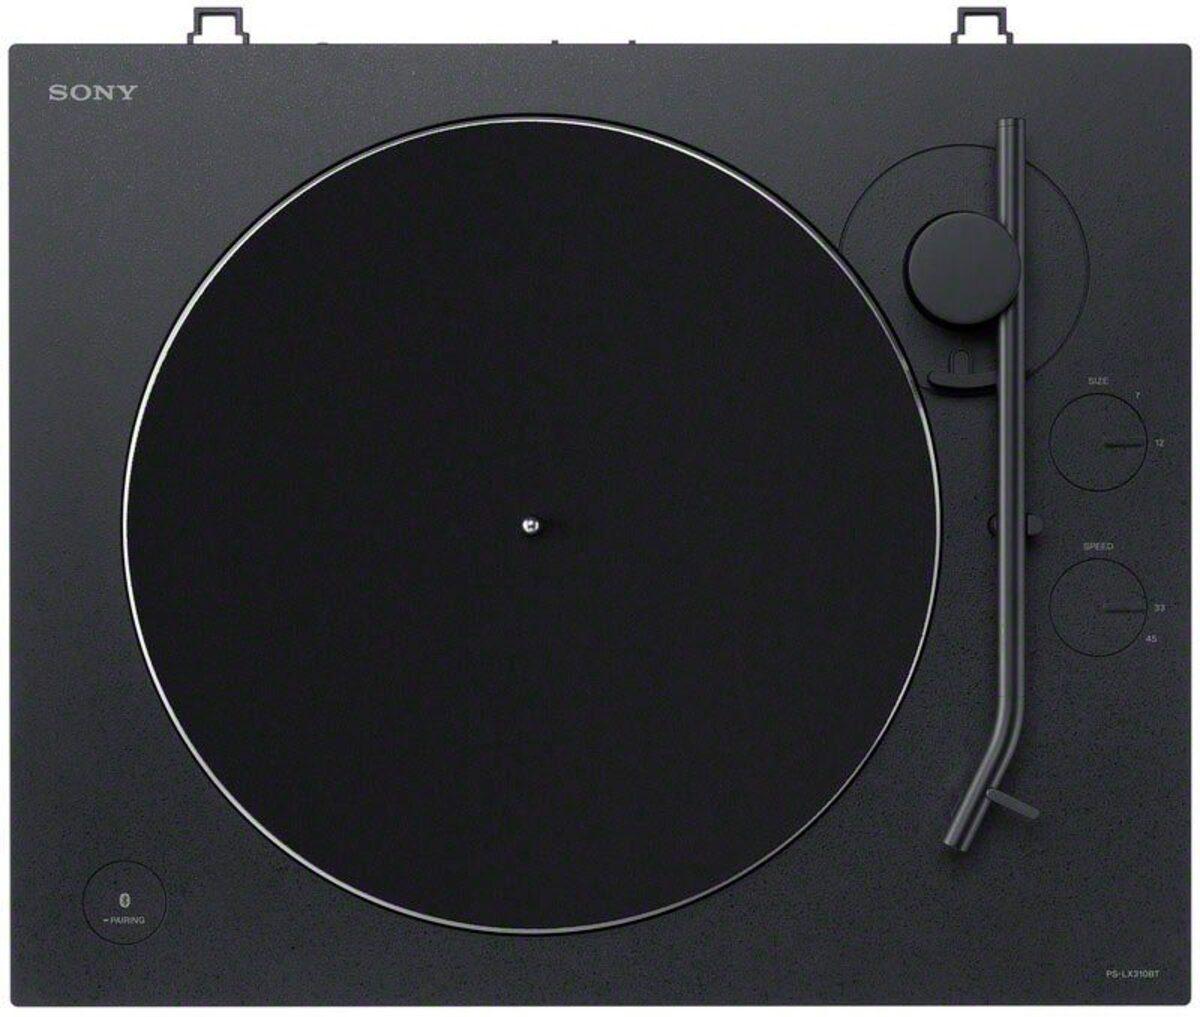 Bild 5 von Sony »PS-LX310BT« Plattenspieler (Riemenantrieb, Bluetooth, Phono Vorverstärker, Auto-Play Funktion, Aluminium Plattenteller)